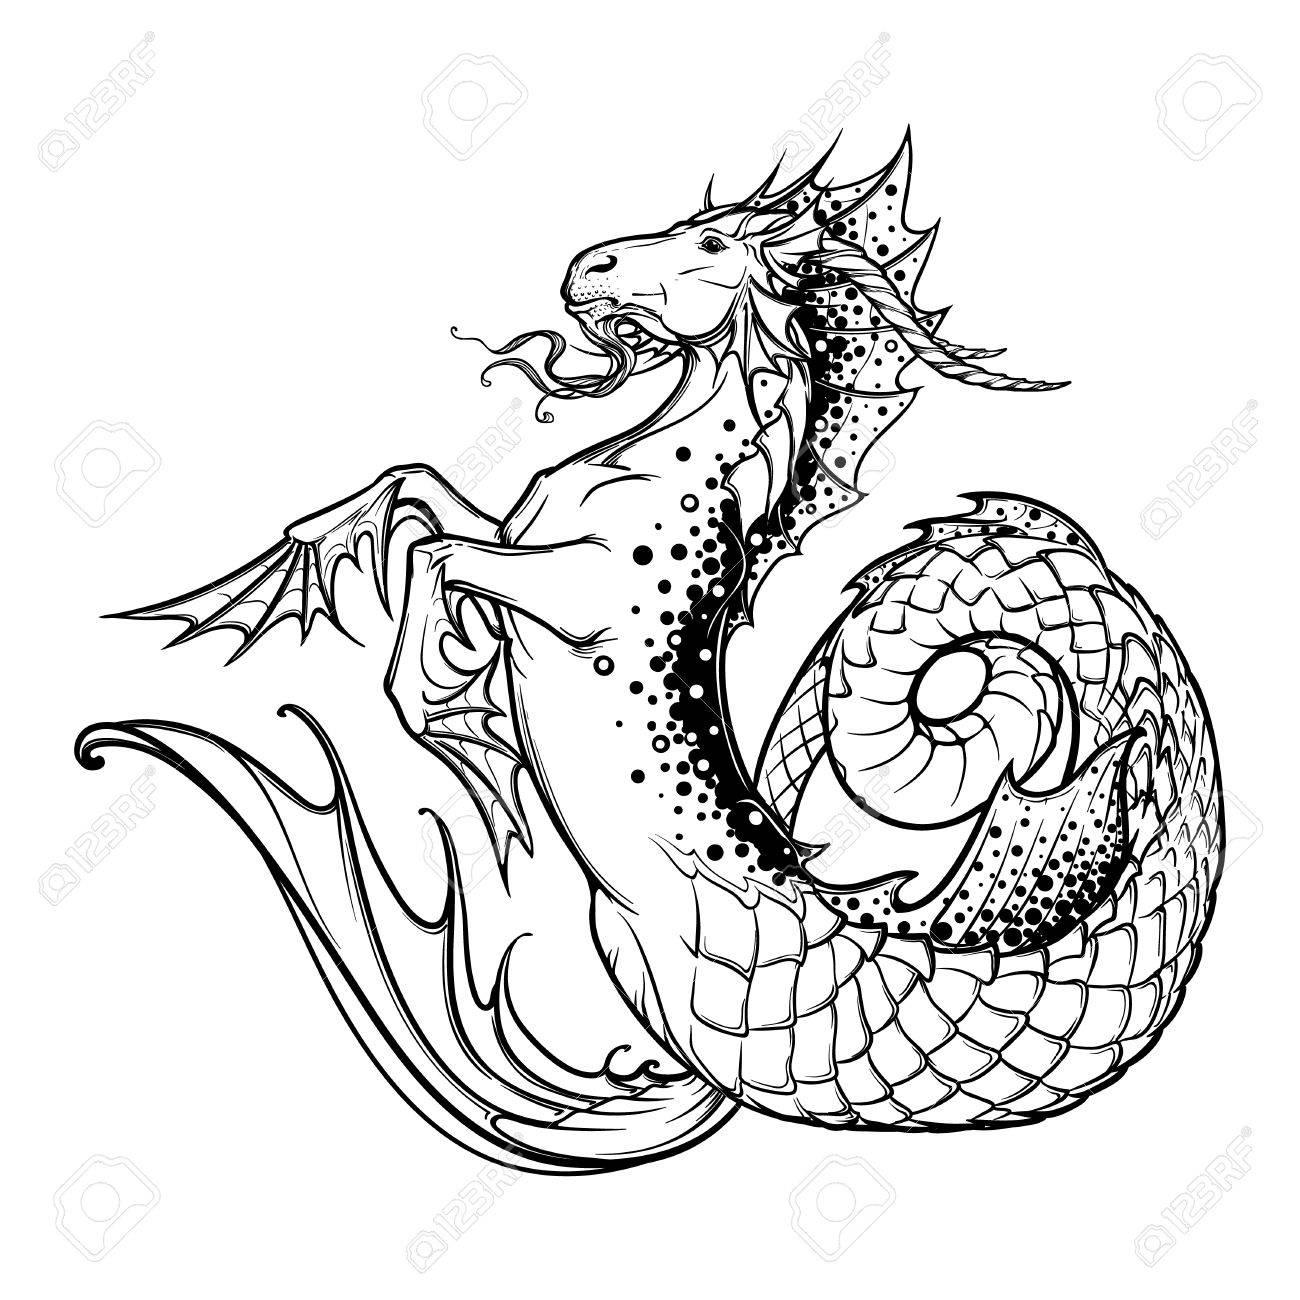 Zodiac Signs Drawing at GetDrawings | Free download